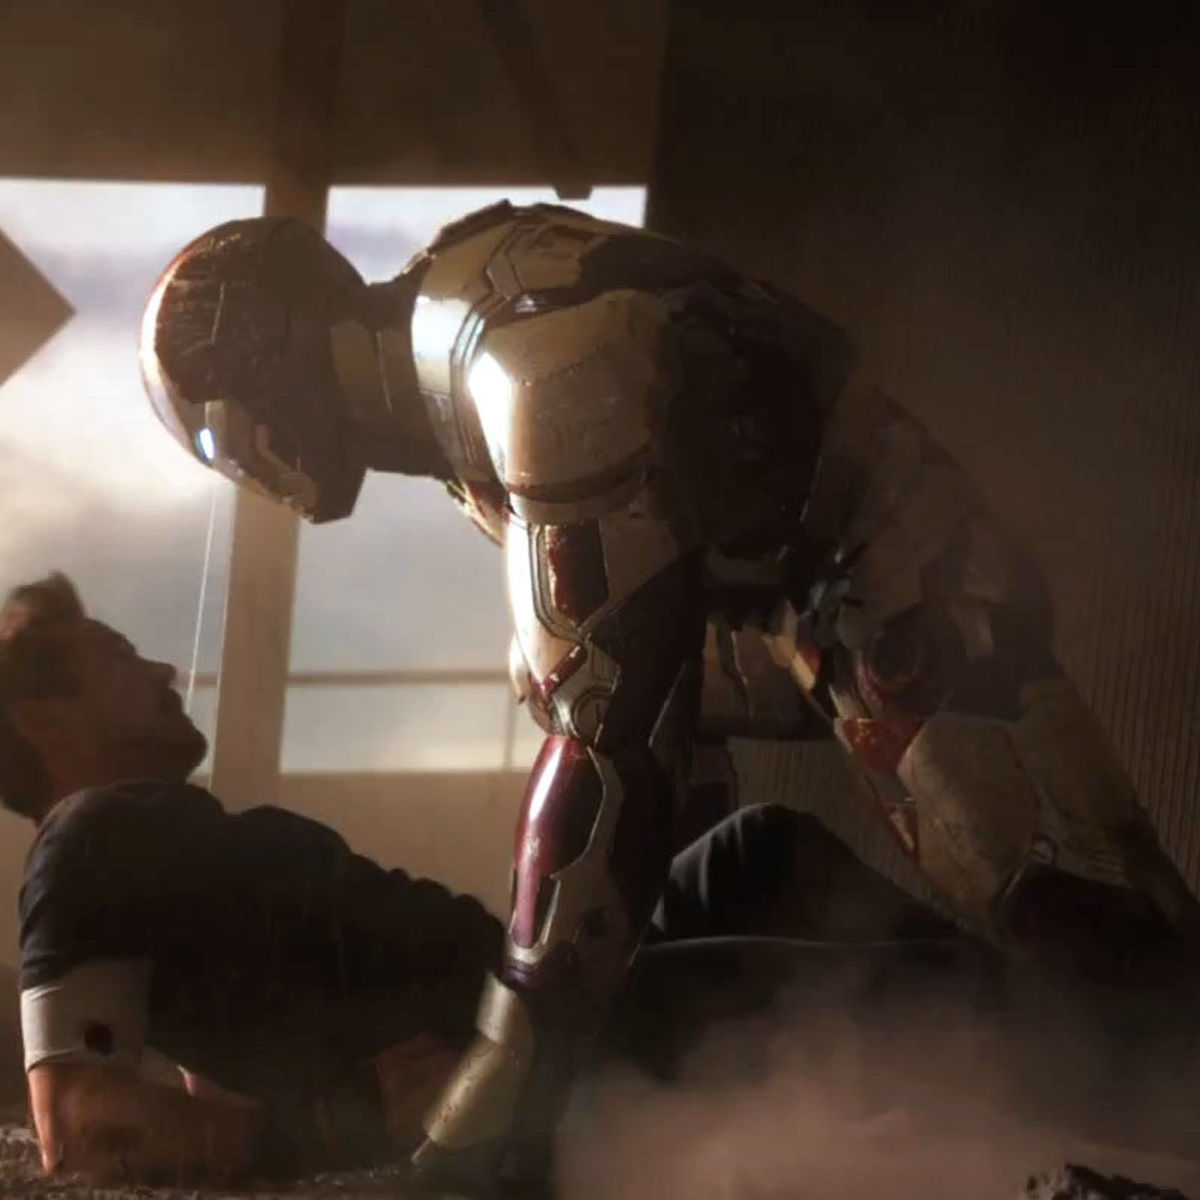 Iron-Man-3-trailer-Still-Stark-Mark-XLVII-copy.jpg